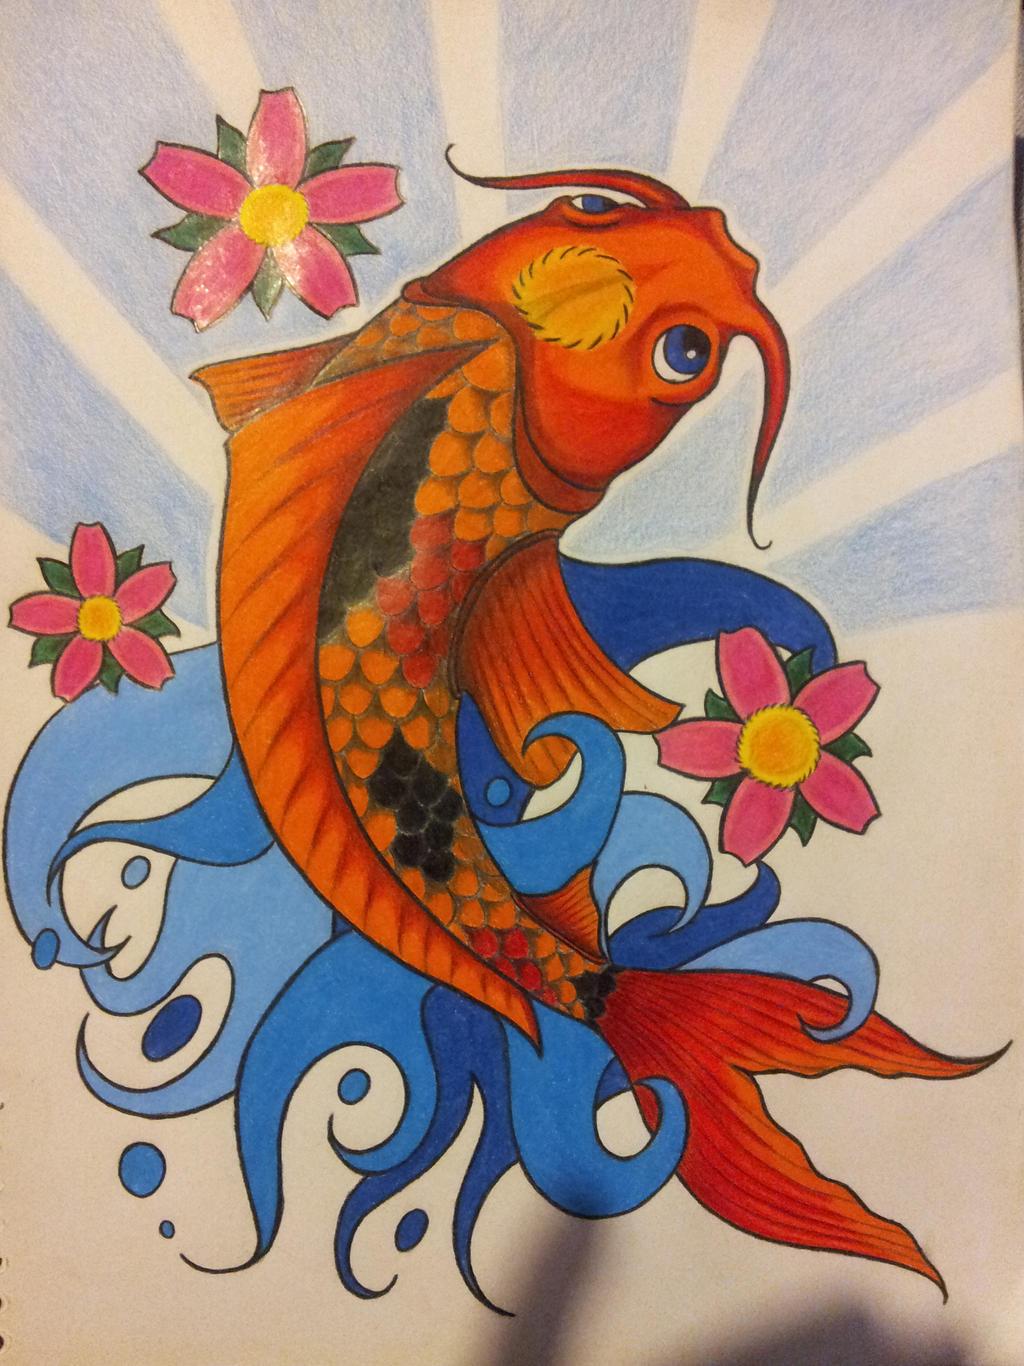 40 Beautiful Koi Fish Tattoo Designs TattooEasilycom - oukas.info